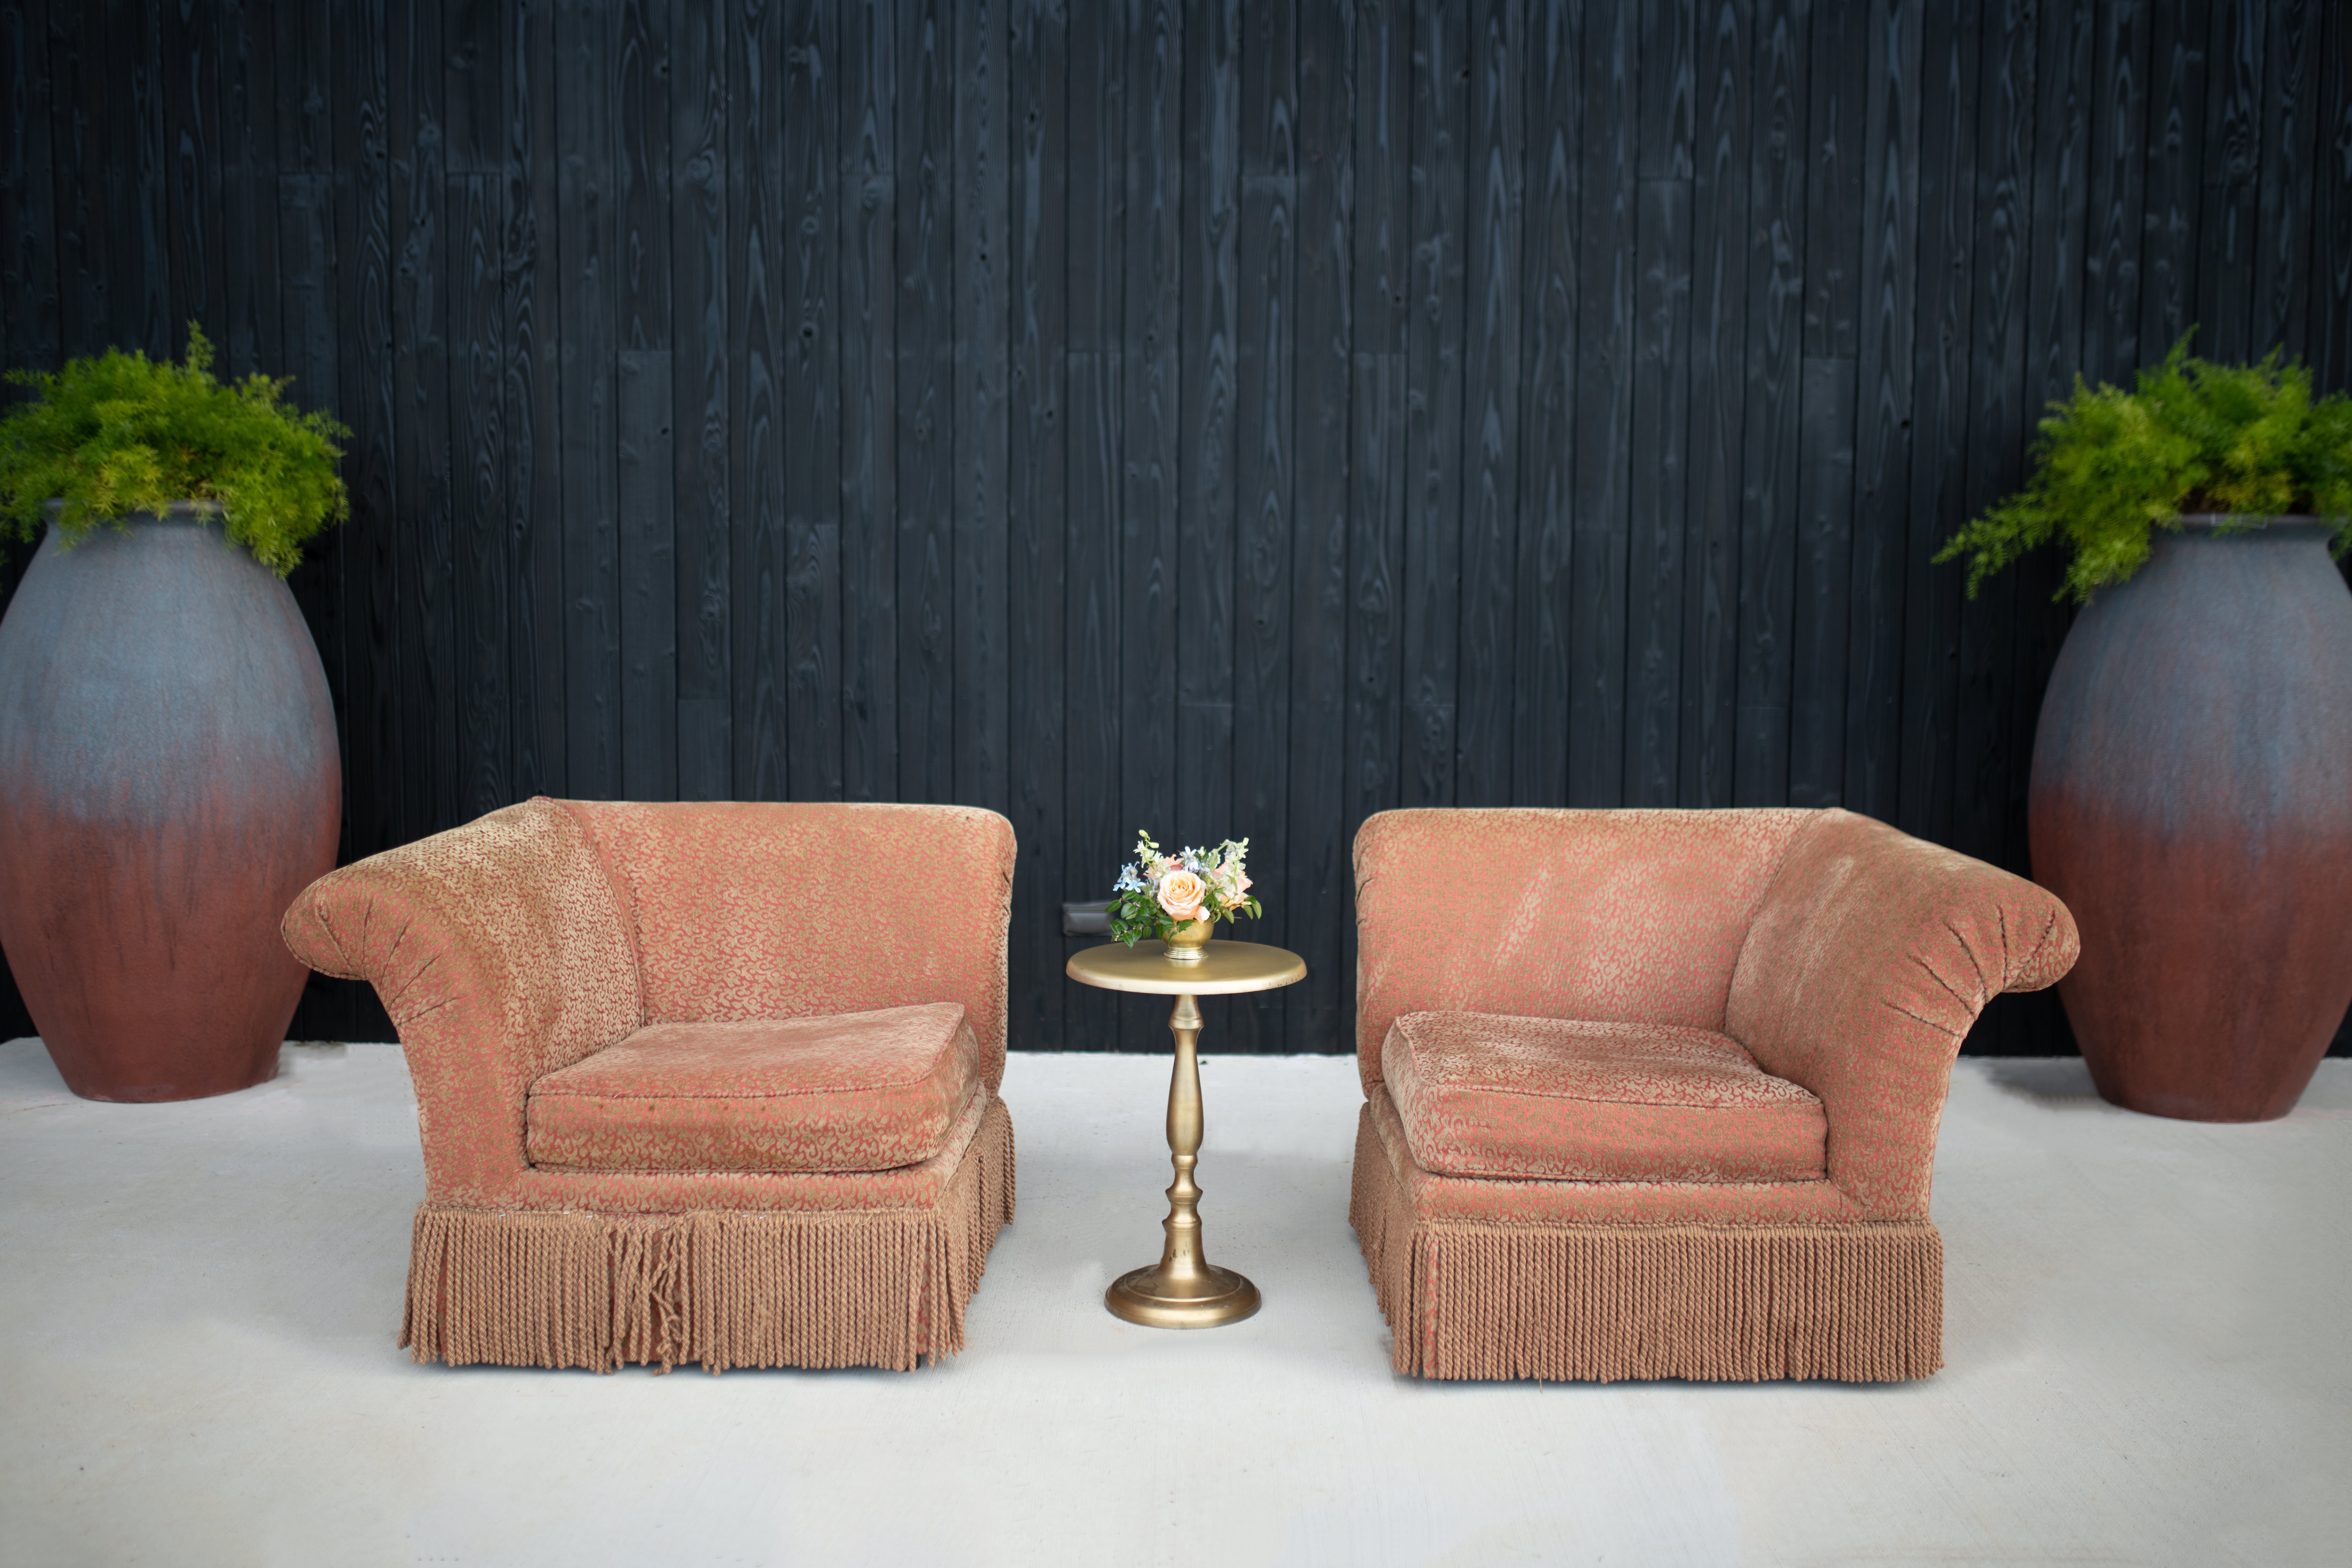 Pontchartrain Chairs